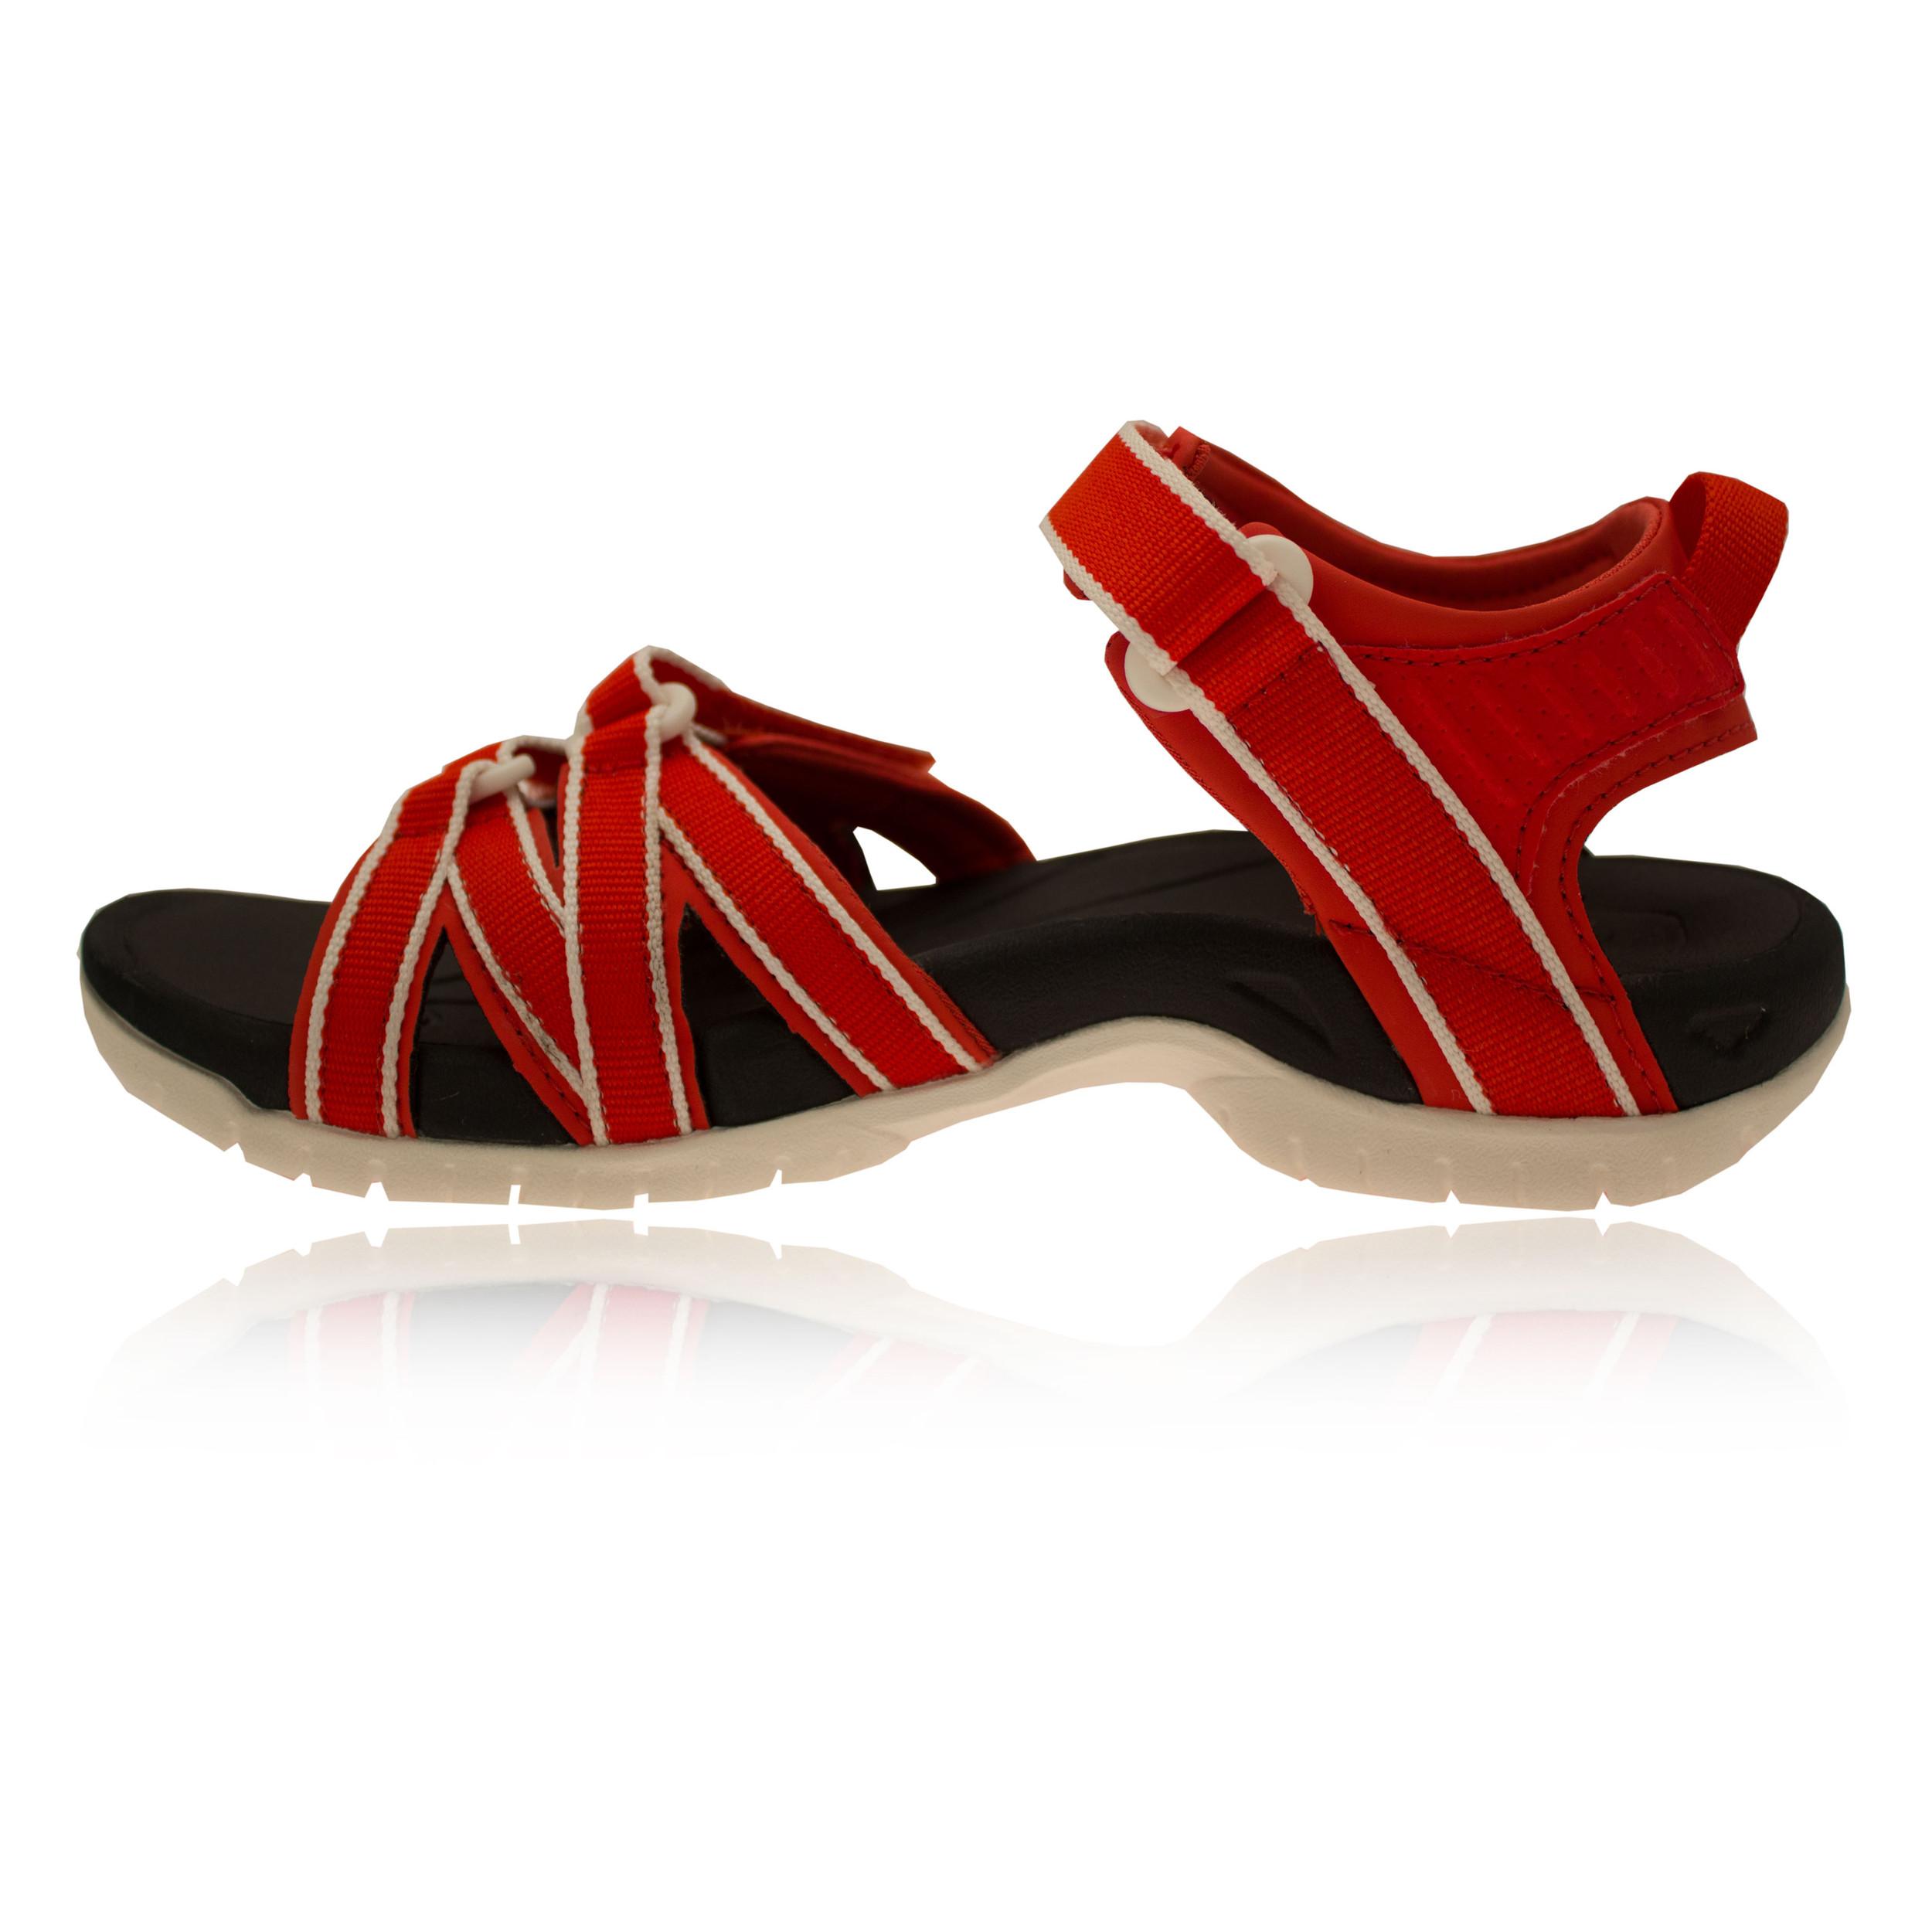 teva tirra damen trekkingsandalen wanderschuhe outdoor sommer sandalen orange ebay. Black Bedroom Furniture Sets. Home Design Ideas